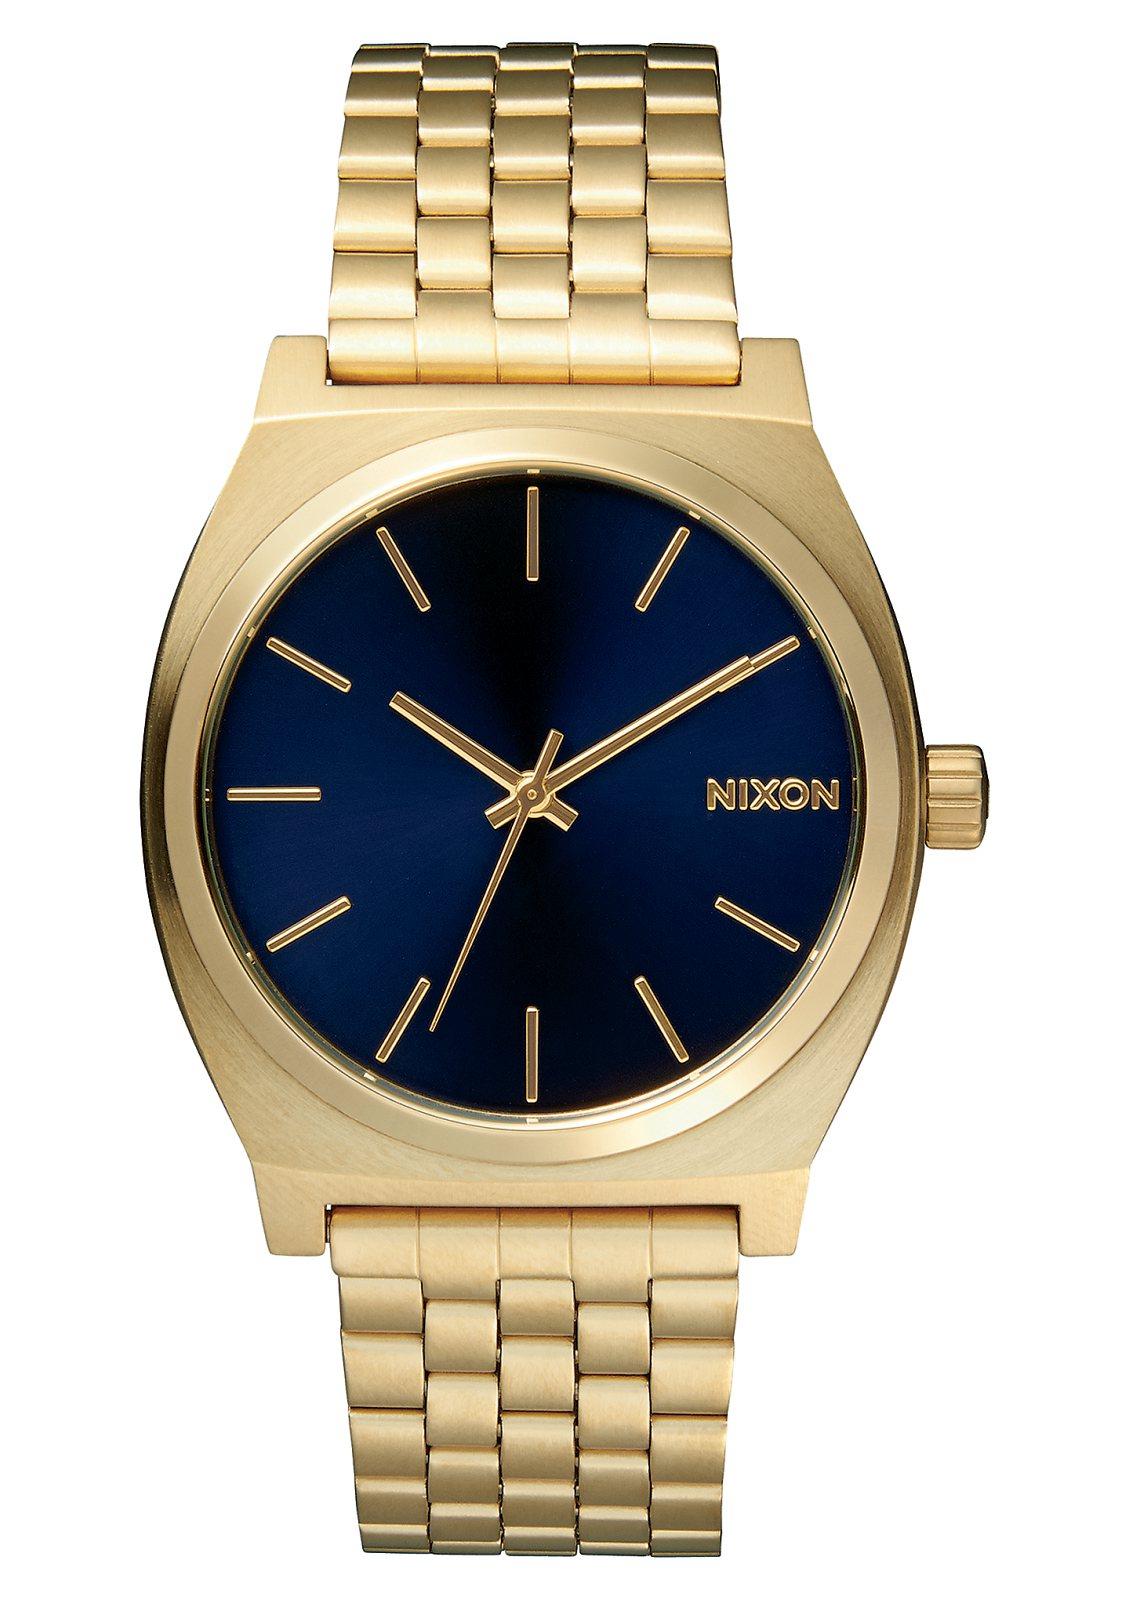 Nixon Time Teller腕表5,500元。圖/麥迪威提供